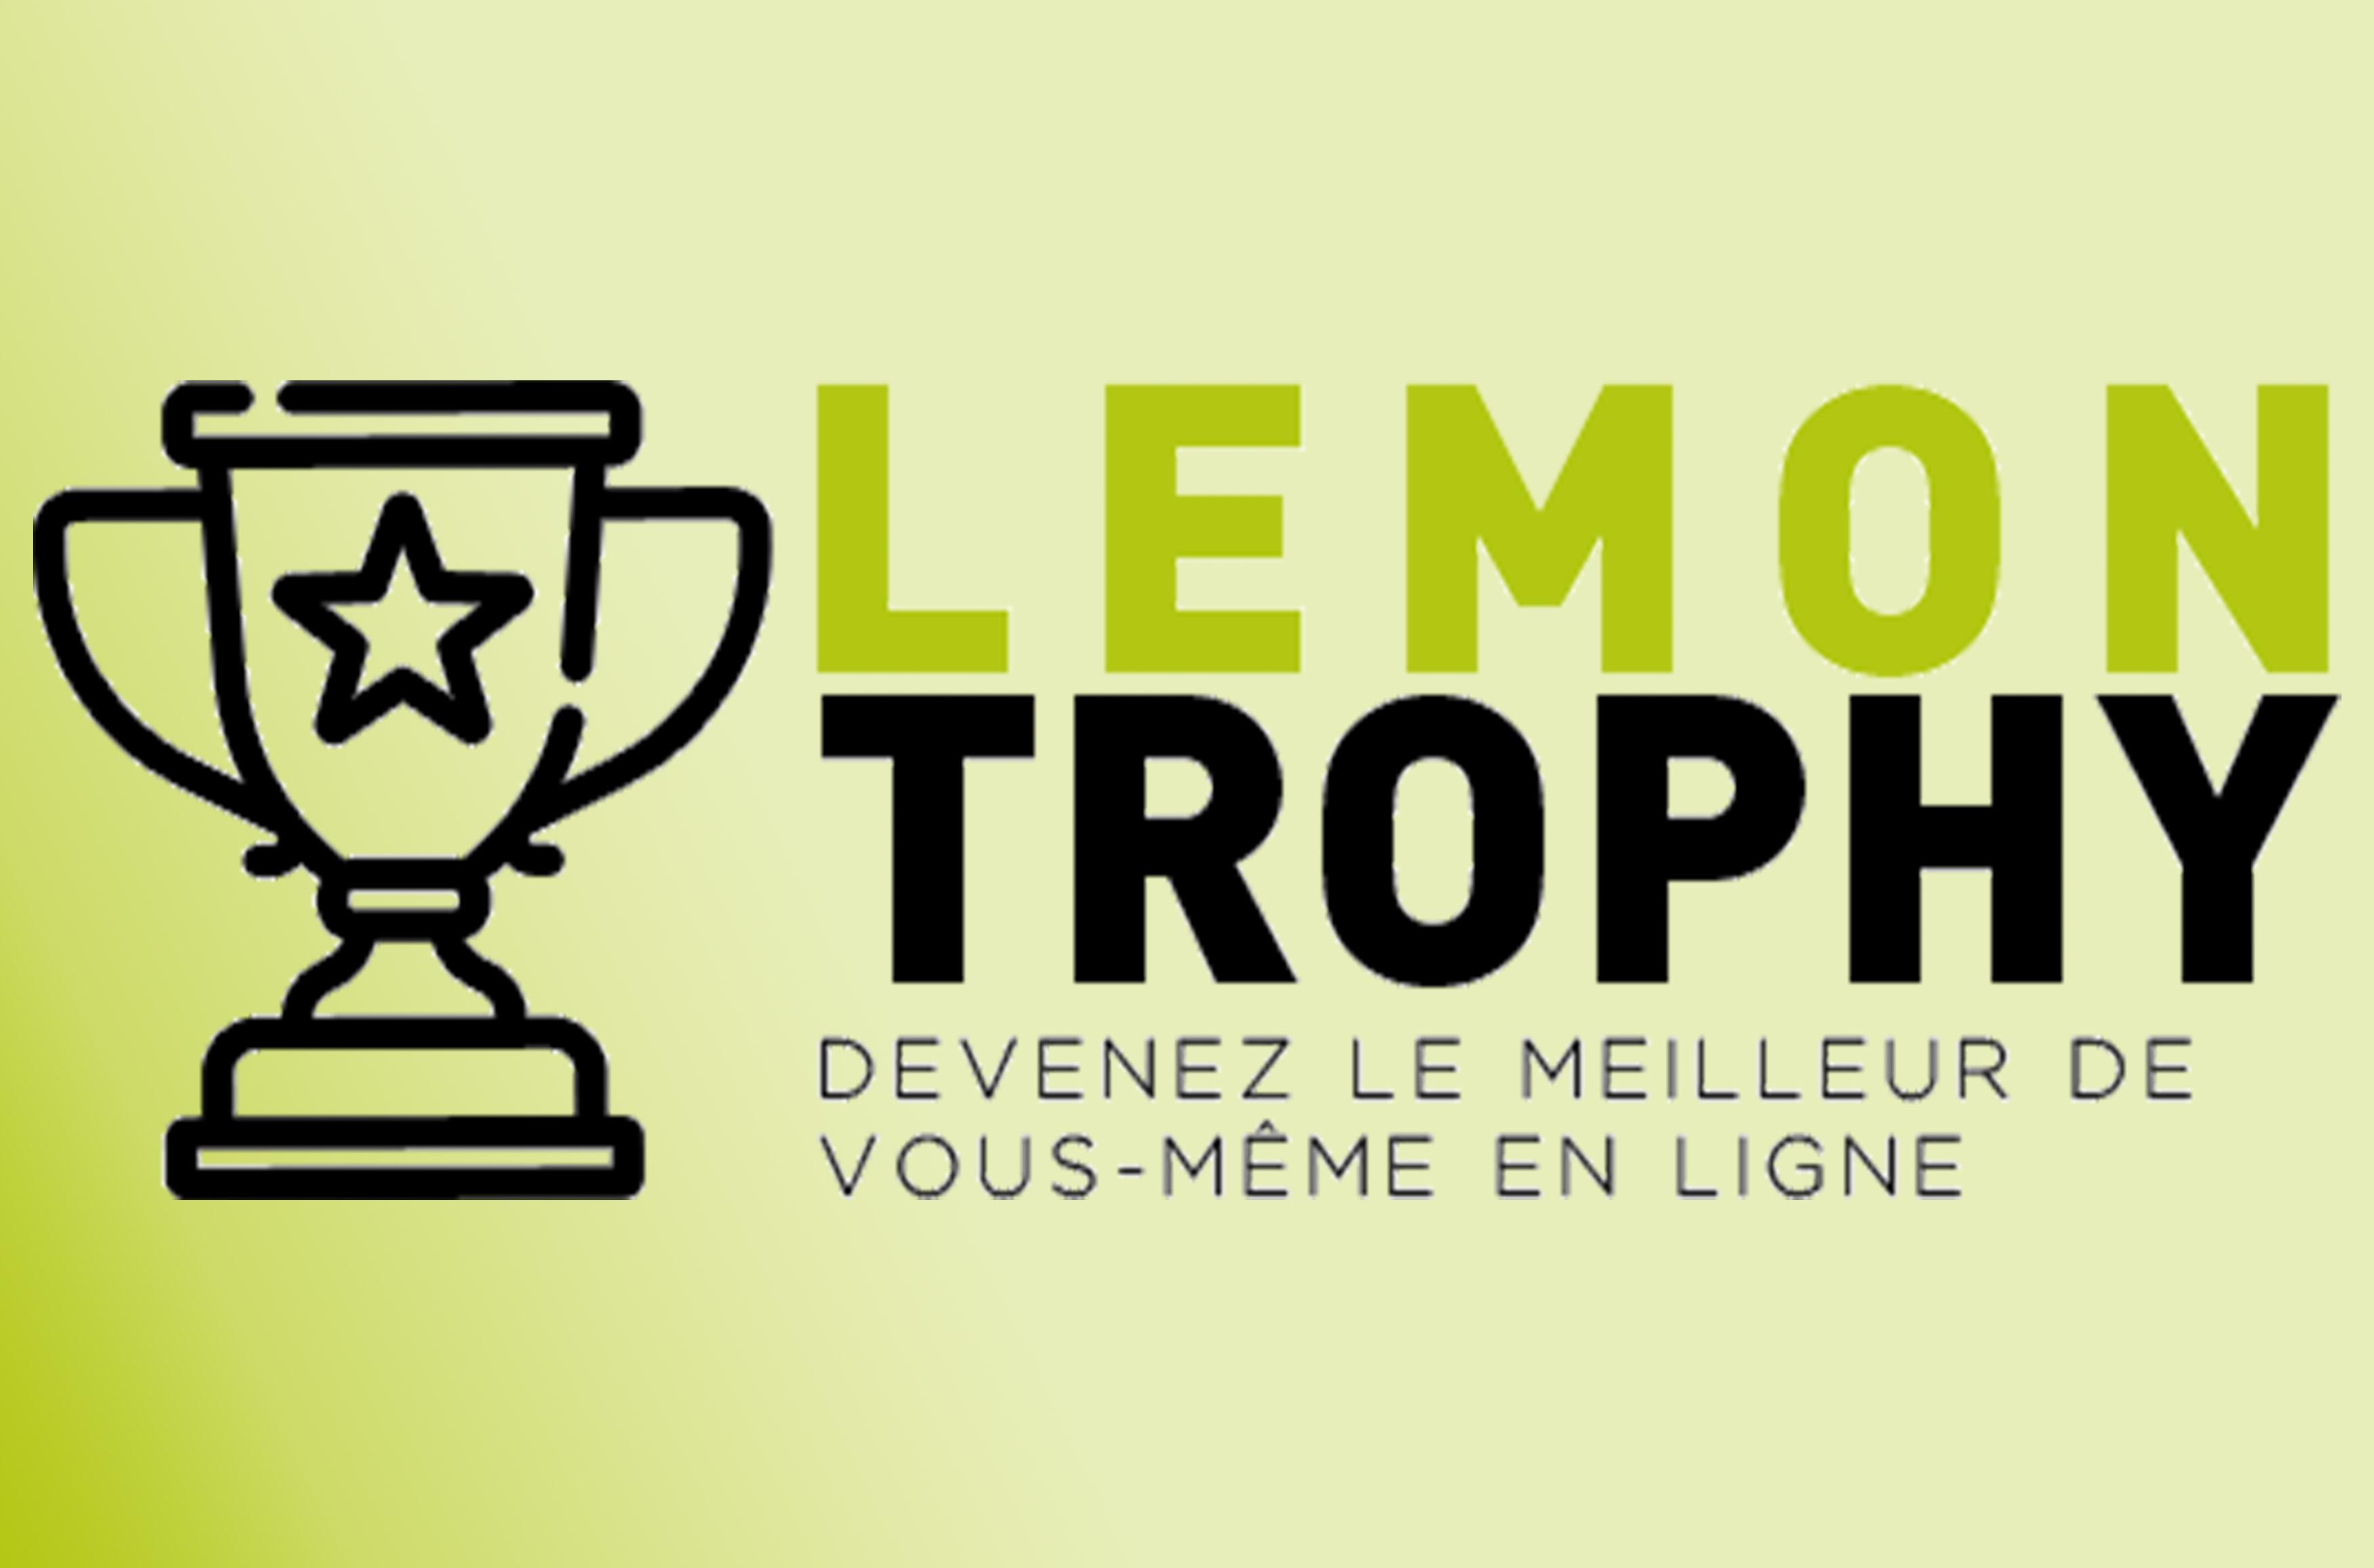 Lemon trophy